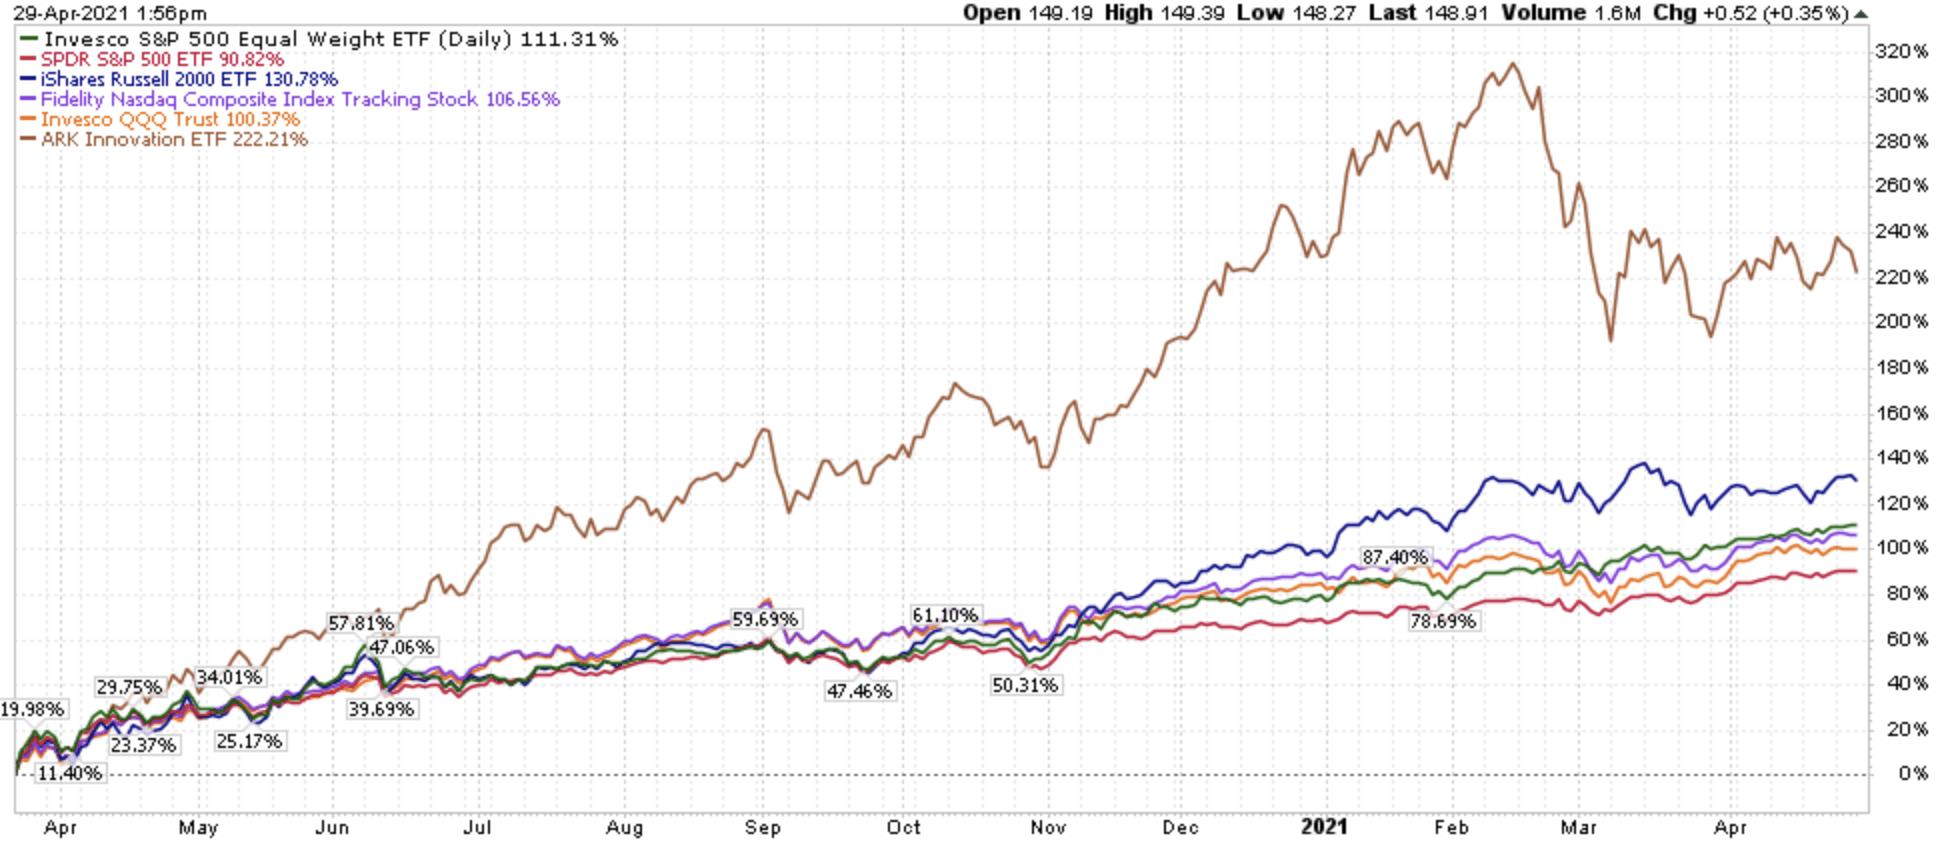 ARKK ETF growth 2020-2021 graph